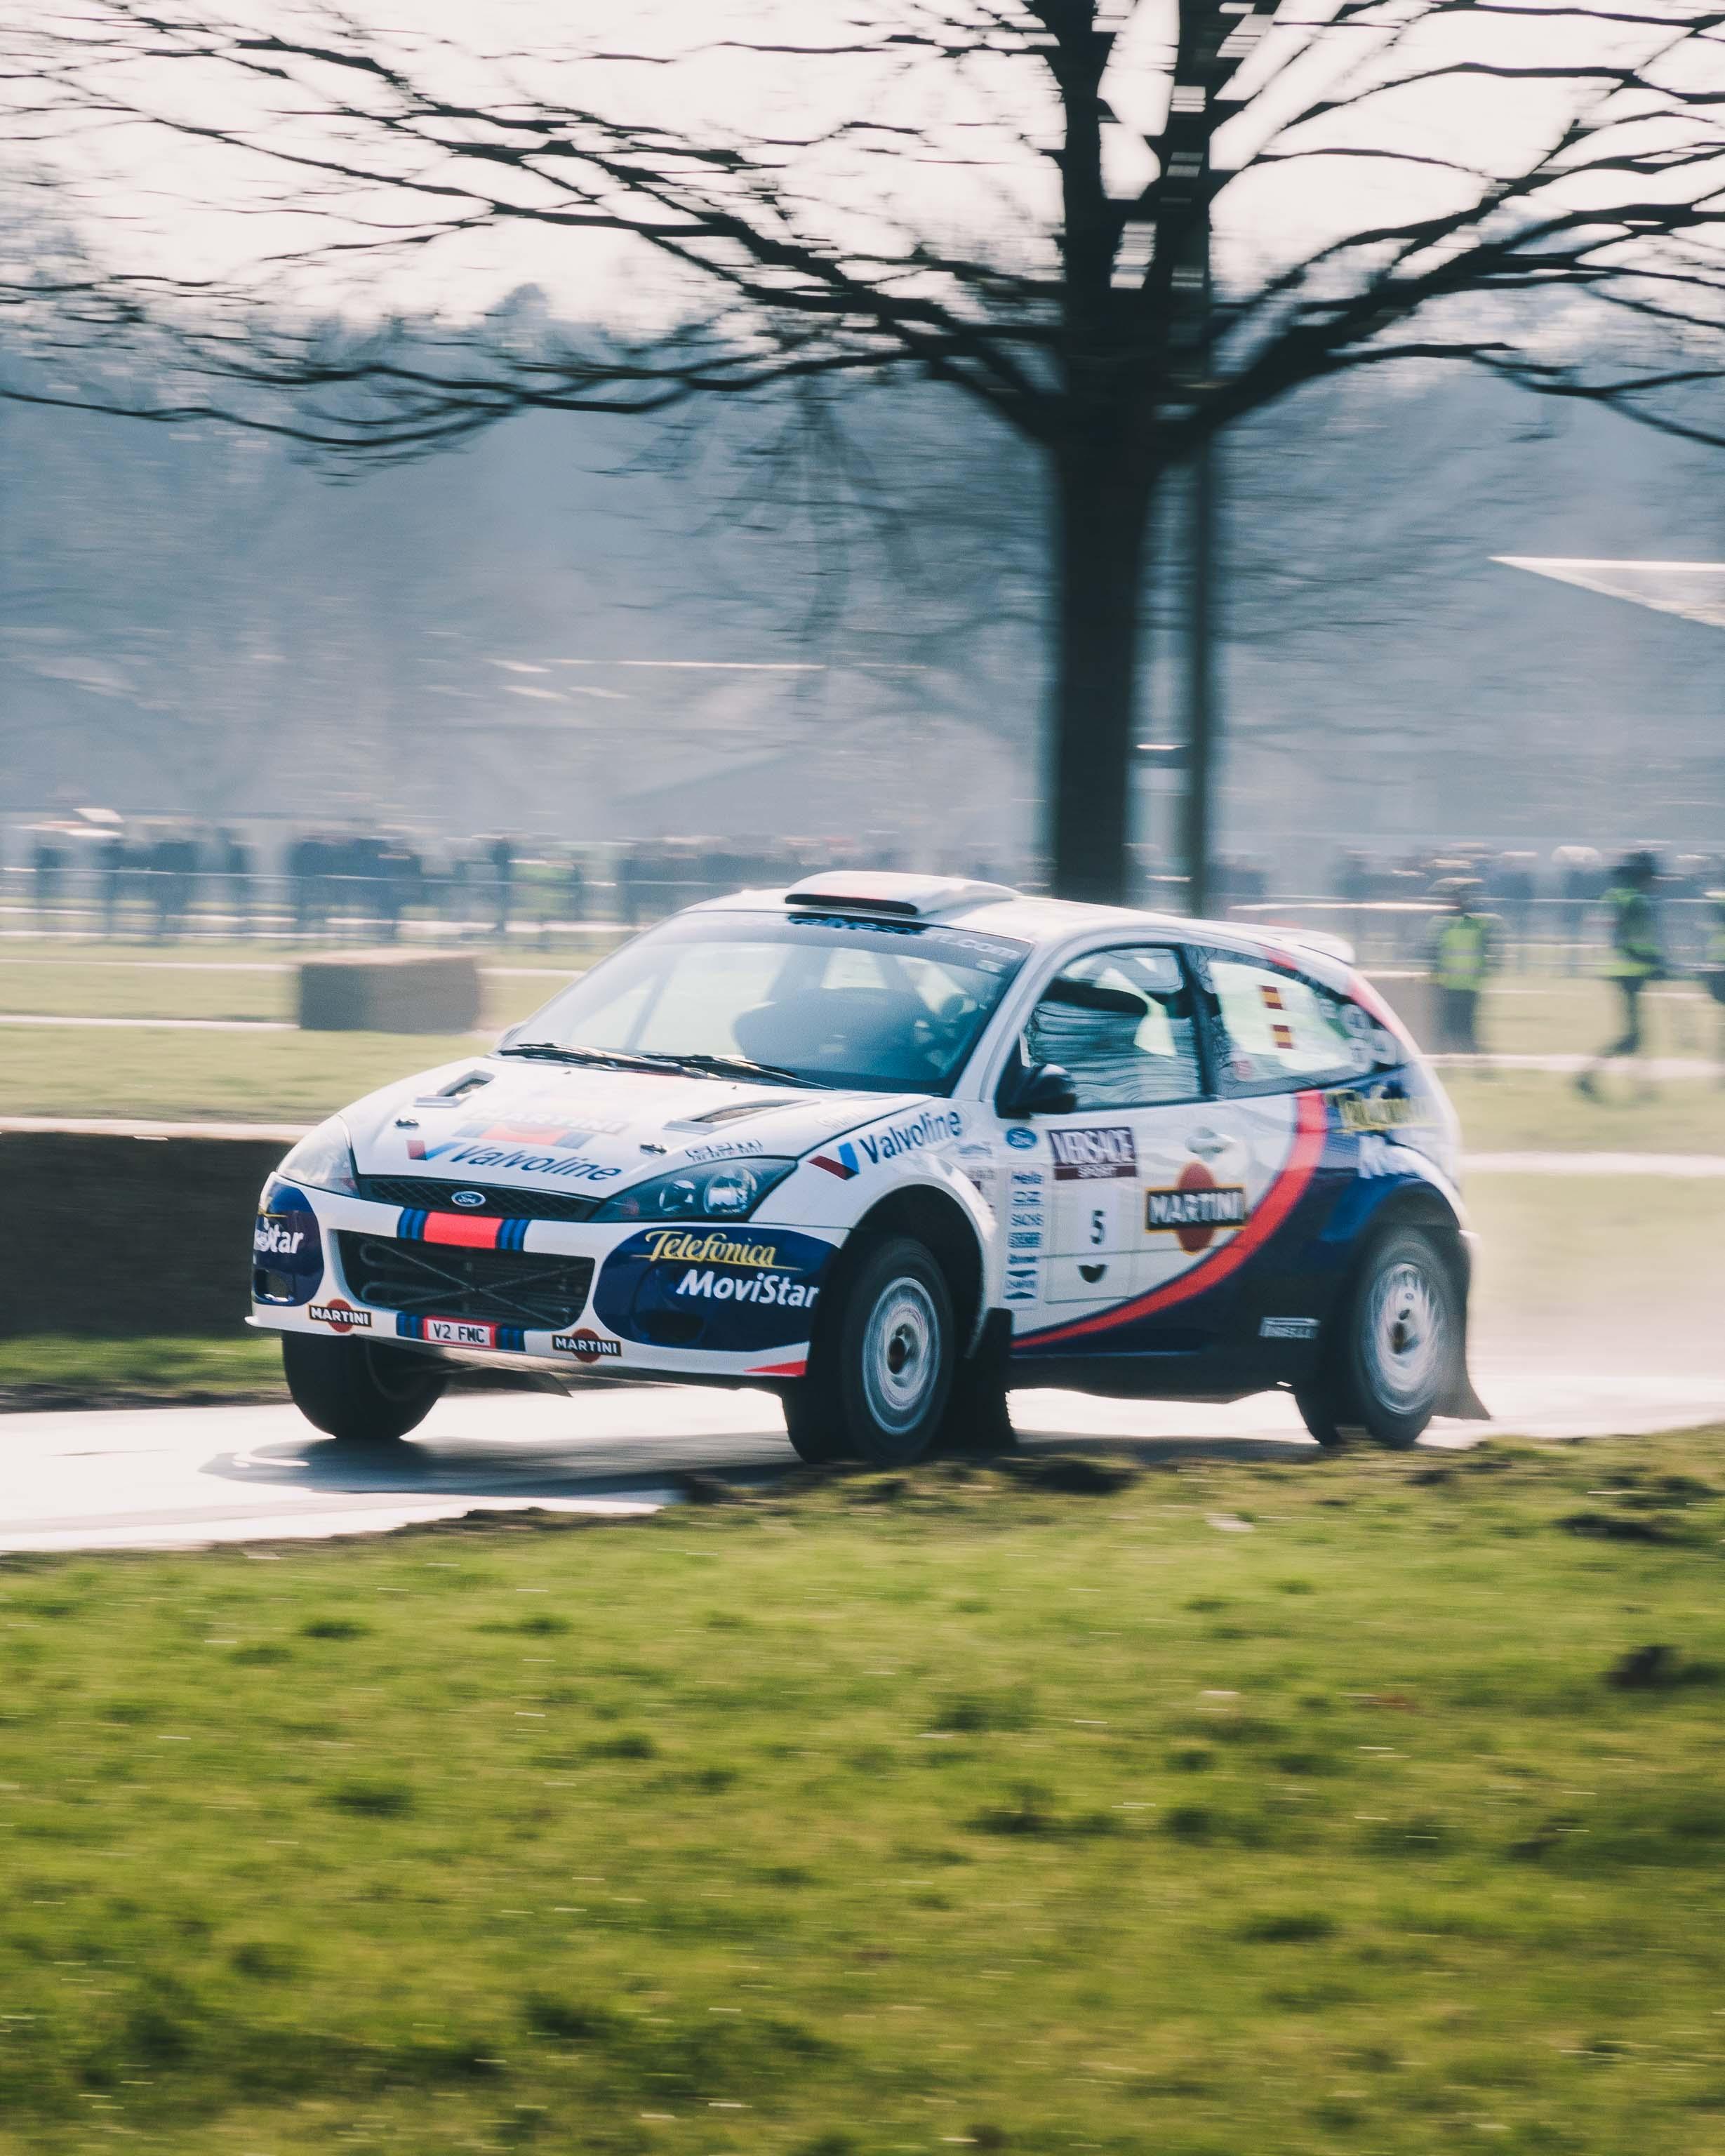 race retro-4.jpg